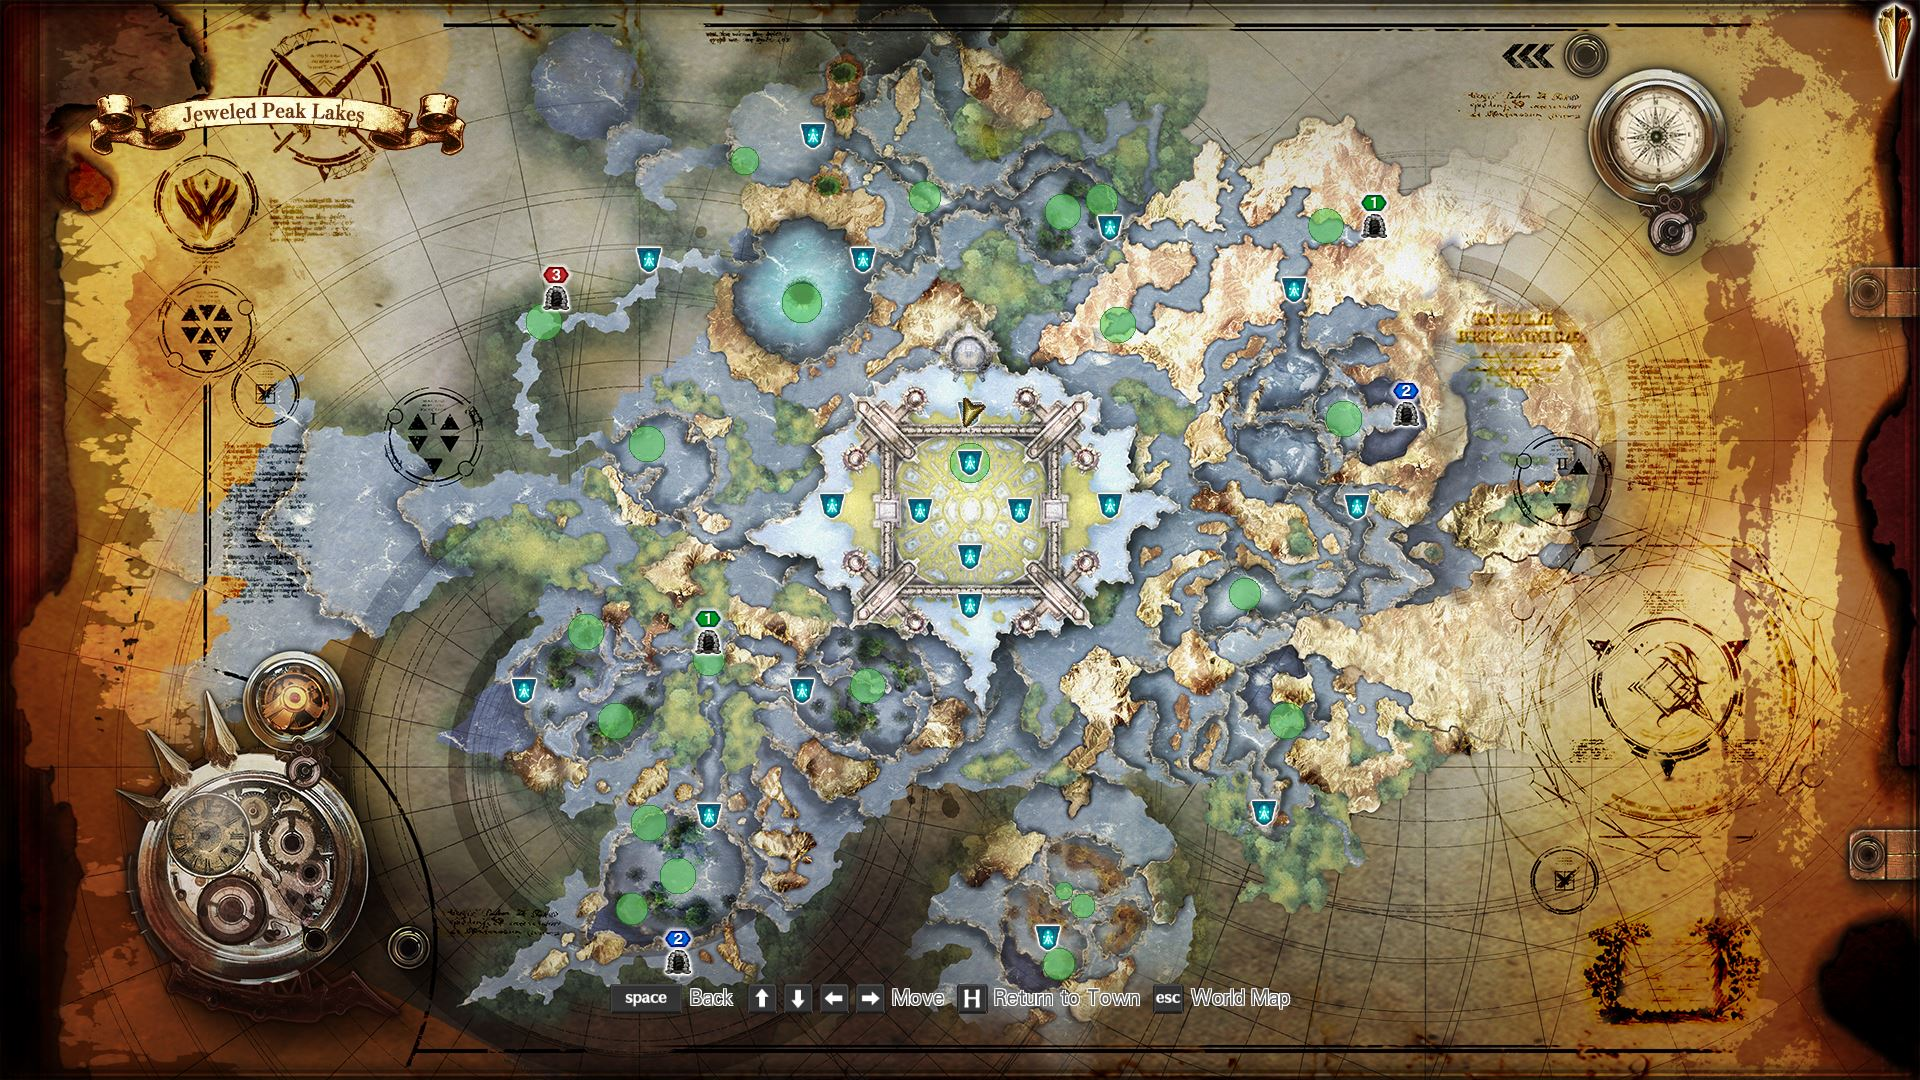 Steam Community :: Guide :: Sword Art Online: Hollow Realization